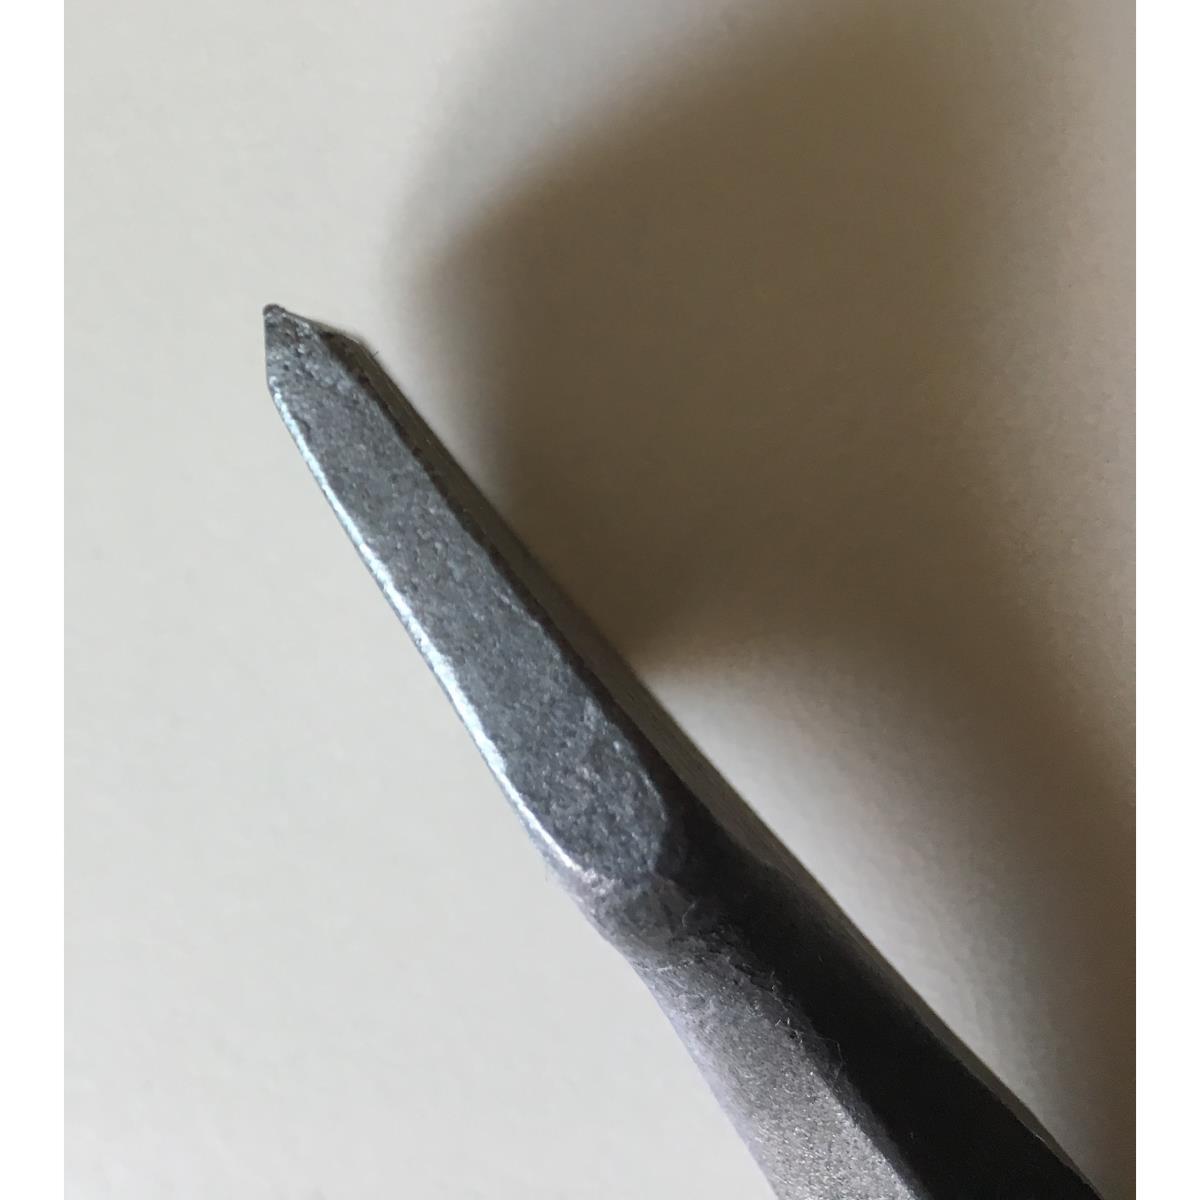 SDS Plus Flachmeissel Breitmeißel 30 breit x 250 mm lang Fliesenmeißel Meißel,Fast,2376, 5907078923765